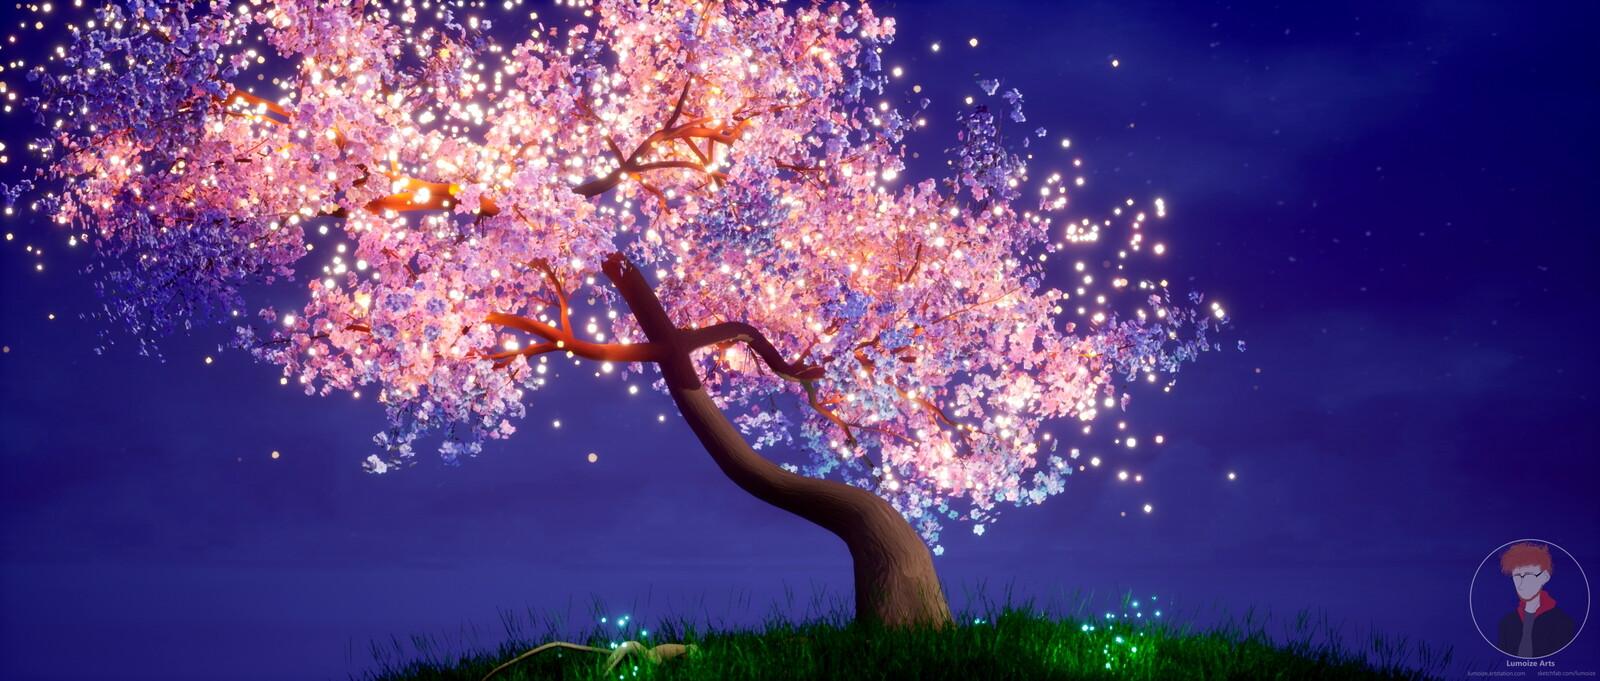 Mystical Cherry Tree Animated Wallpaper